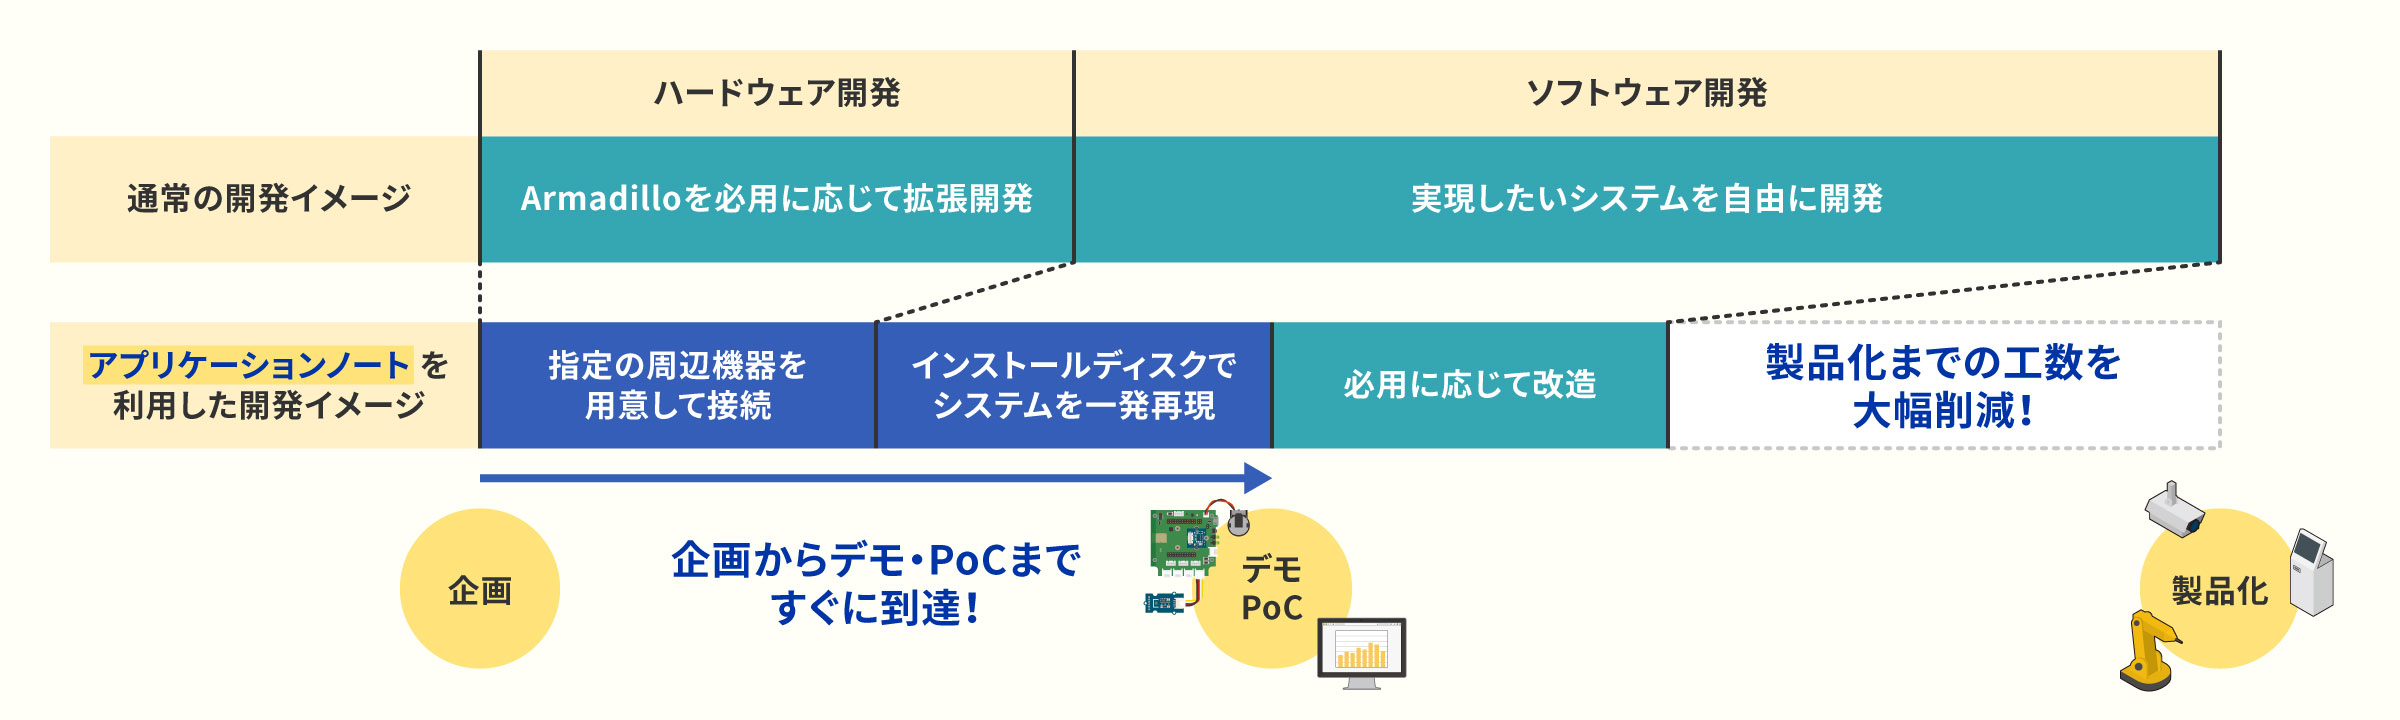 202005_application-note_image.jpg